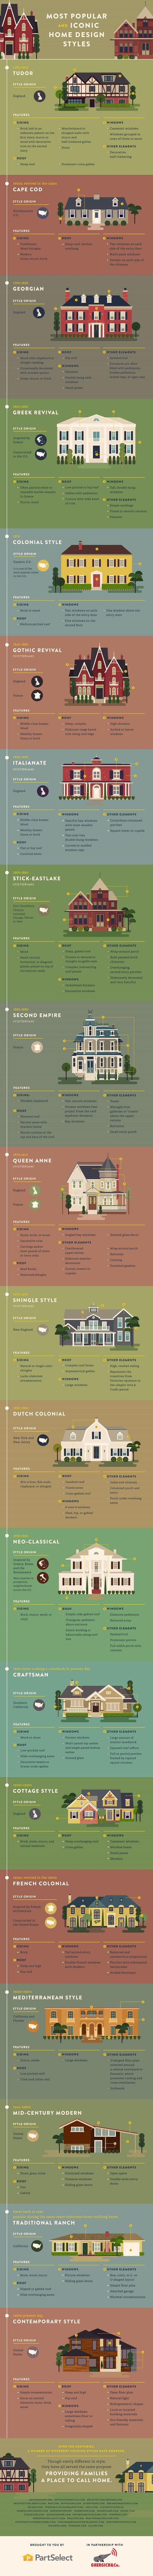 8_28_home_style_info.jpg